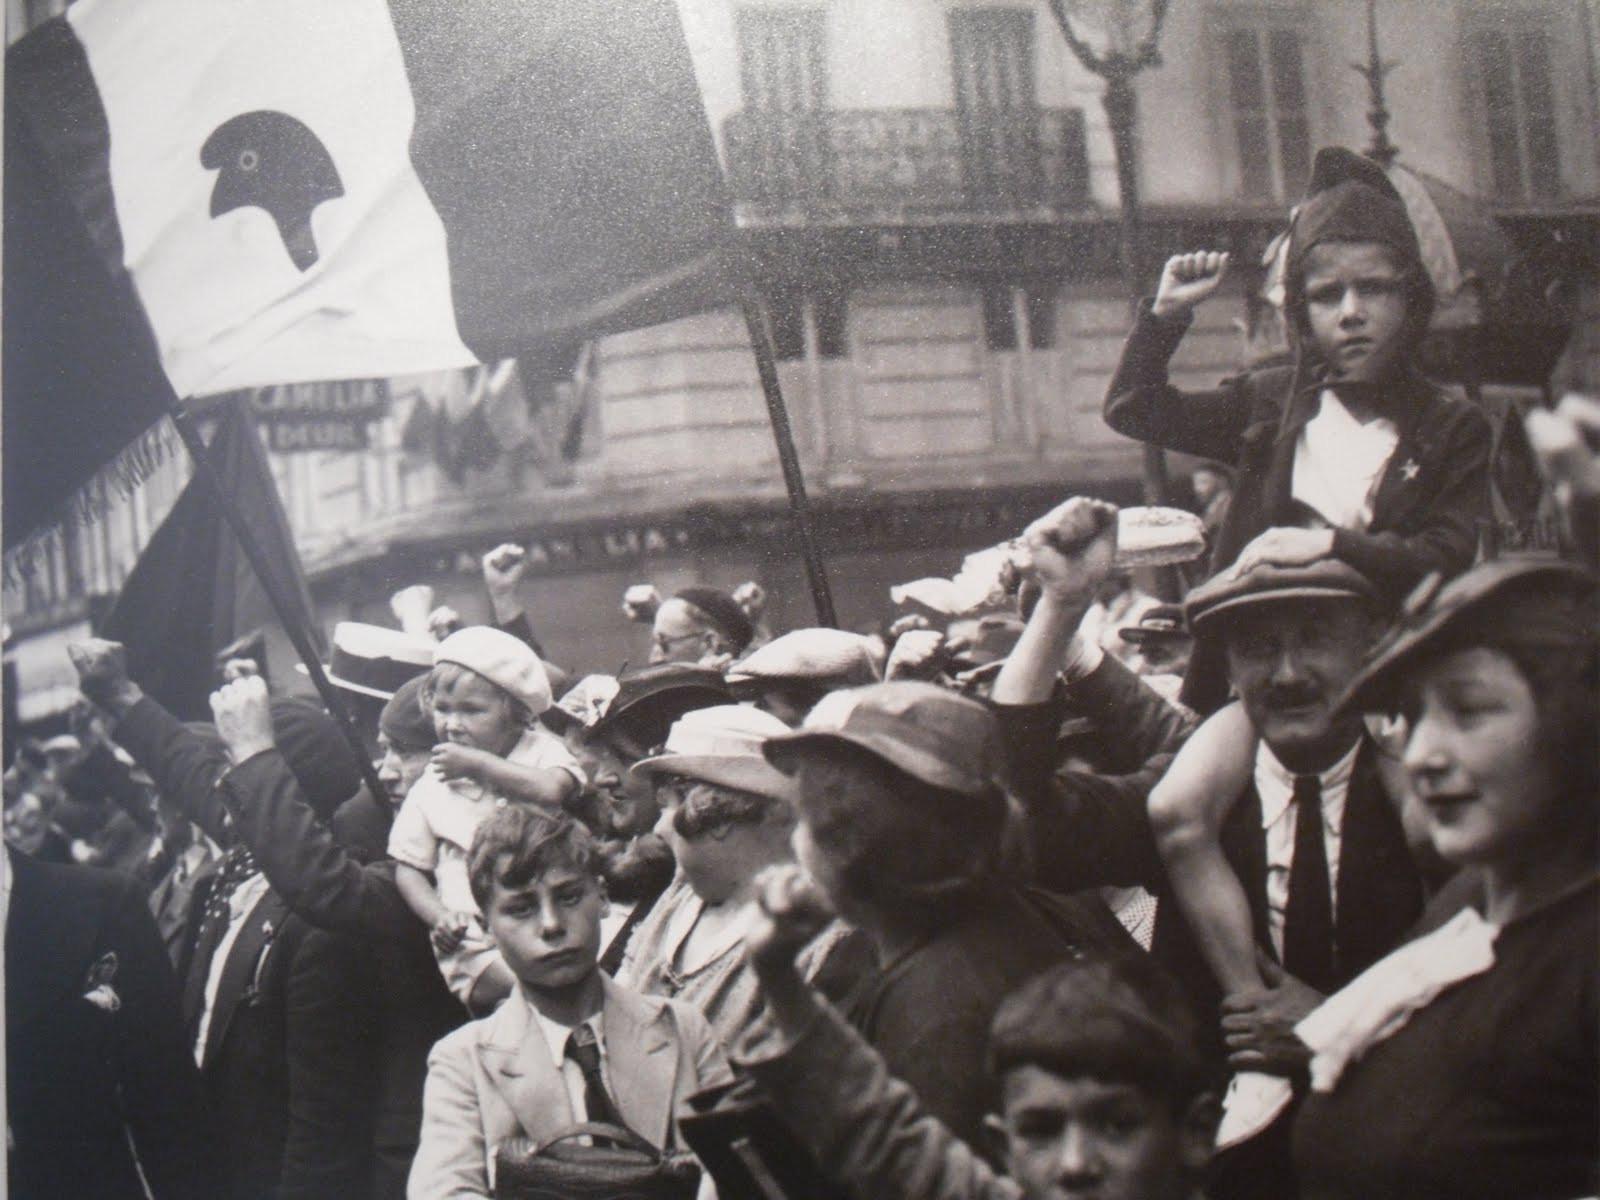 1936. Демонстрация Народного Фронта в Париже